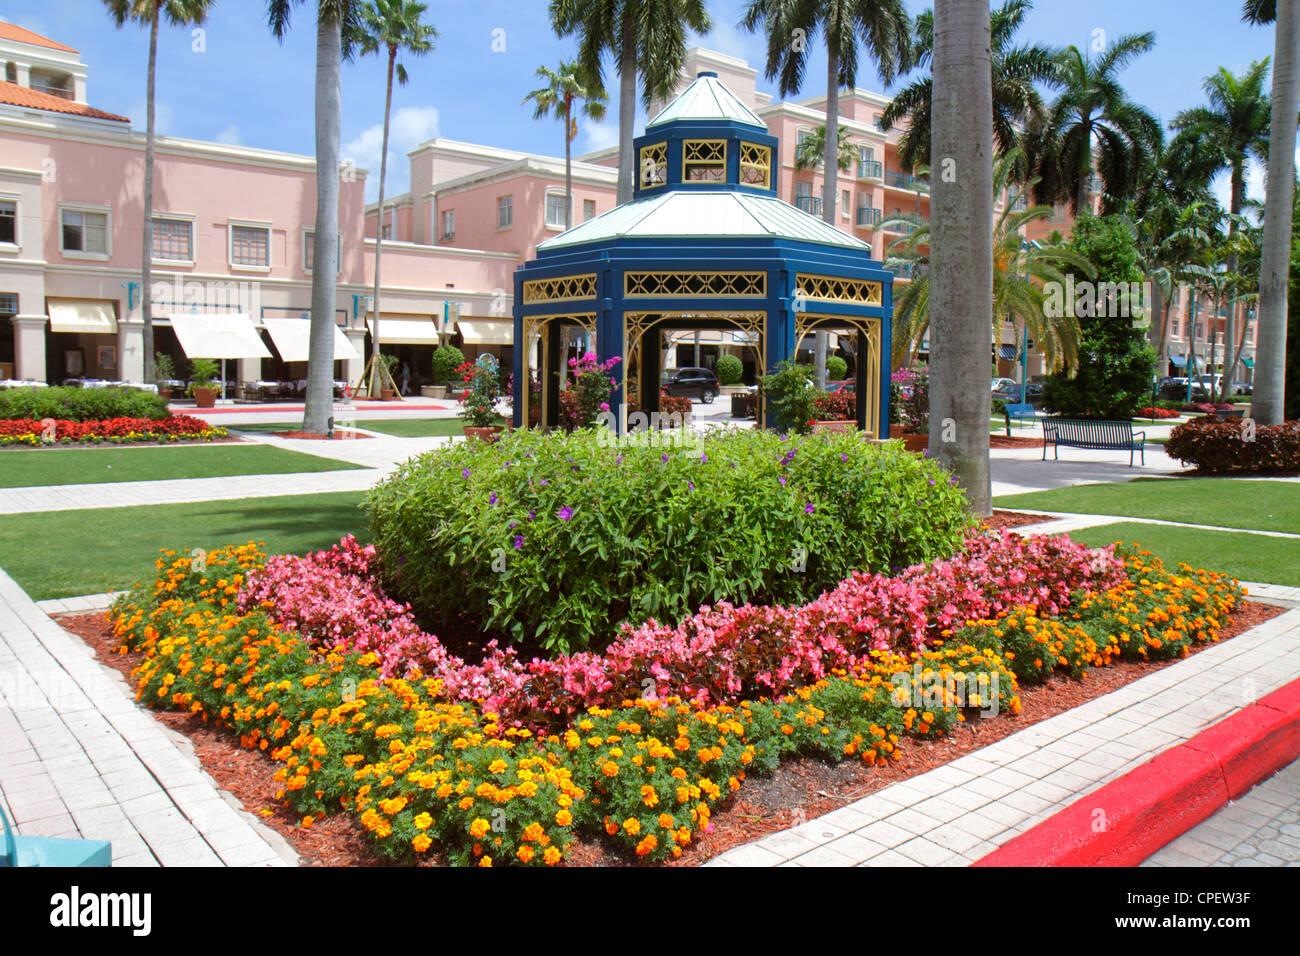 Boca Raton Florida Mizner Park Plaza Real upscale shopping business Stock Pho